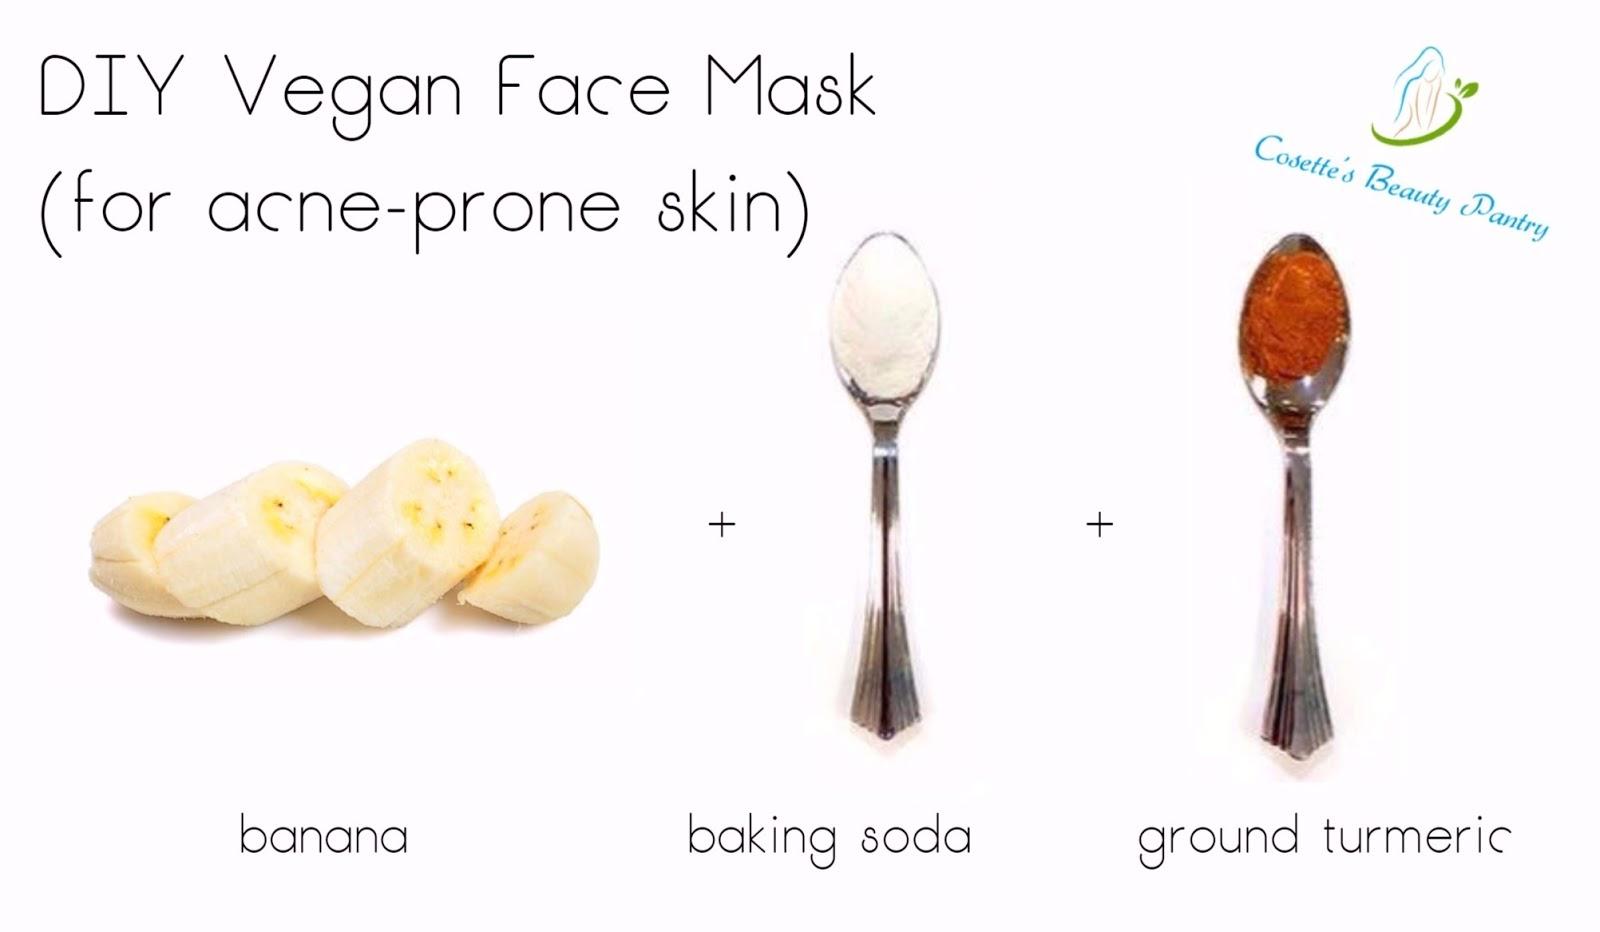 Cosette S Beauty Pantry Diy Vegan Face Mask For Acne Prone Skin